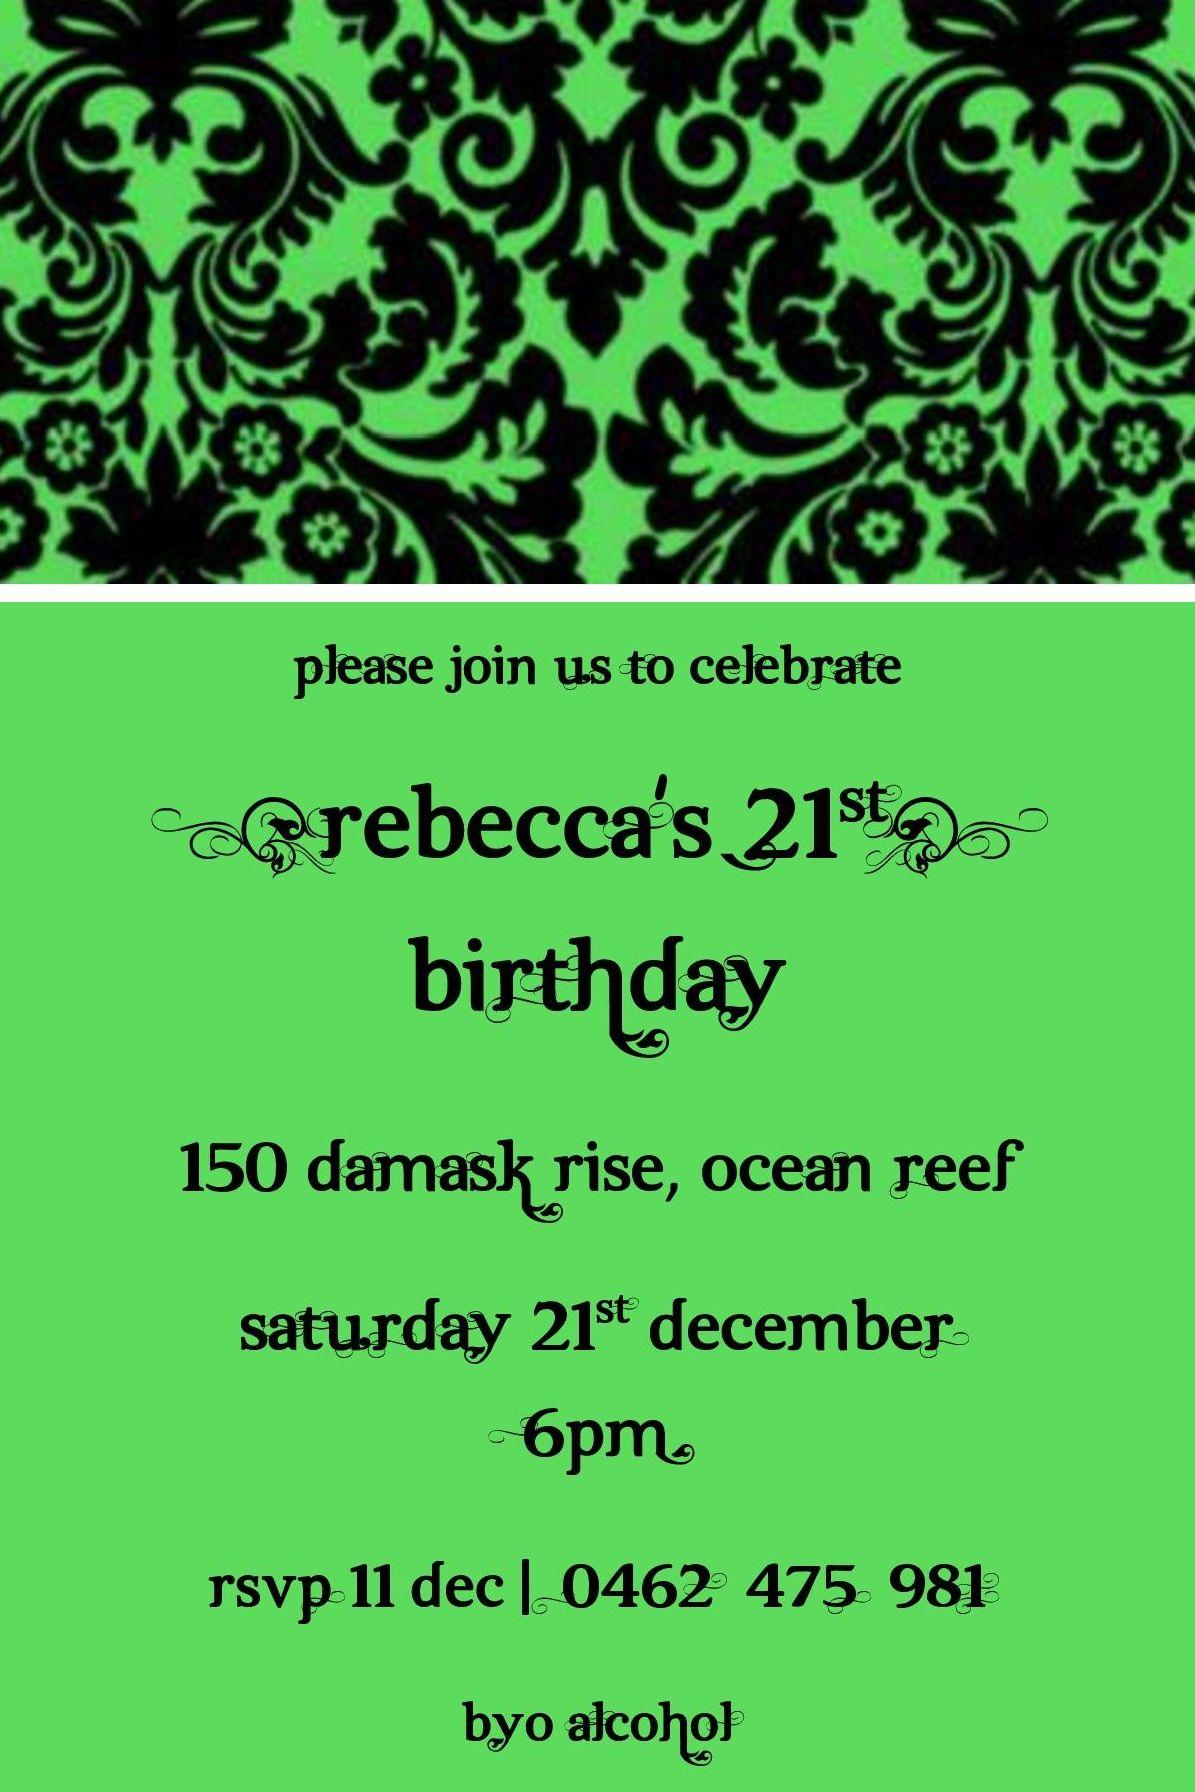 21st birthday invitation - green black | Invitations | Pinterest